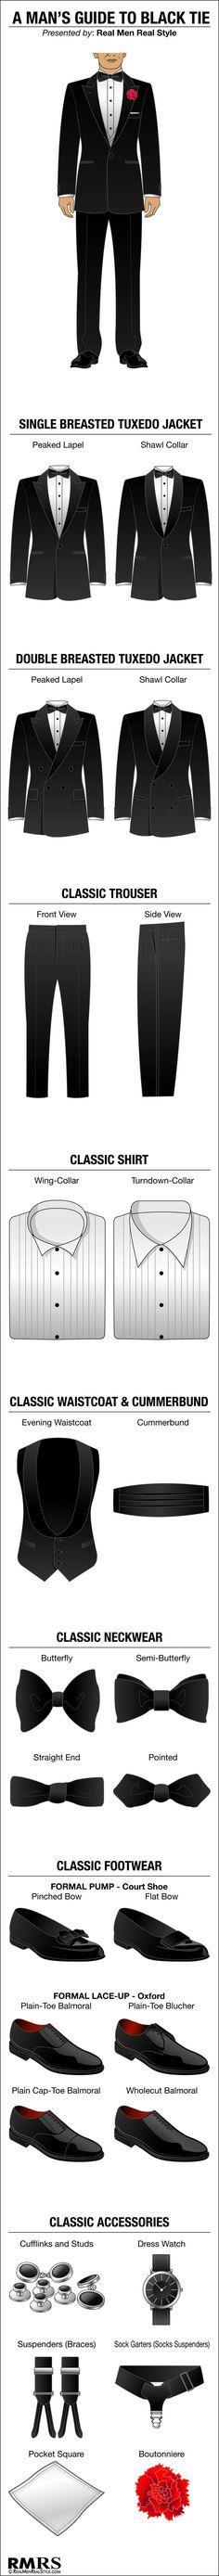 How To Wear Black Tie Infographic – Visual Guide To Wearing A Tuxedo (via @Antonio Centeno)